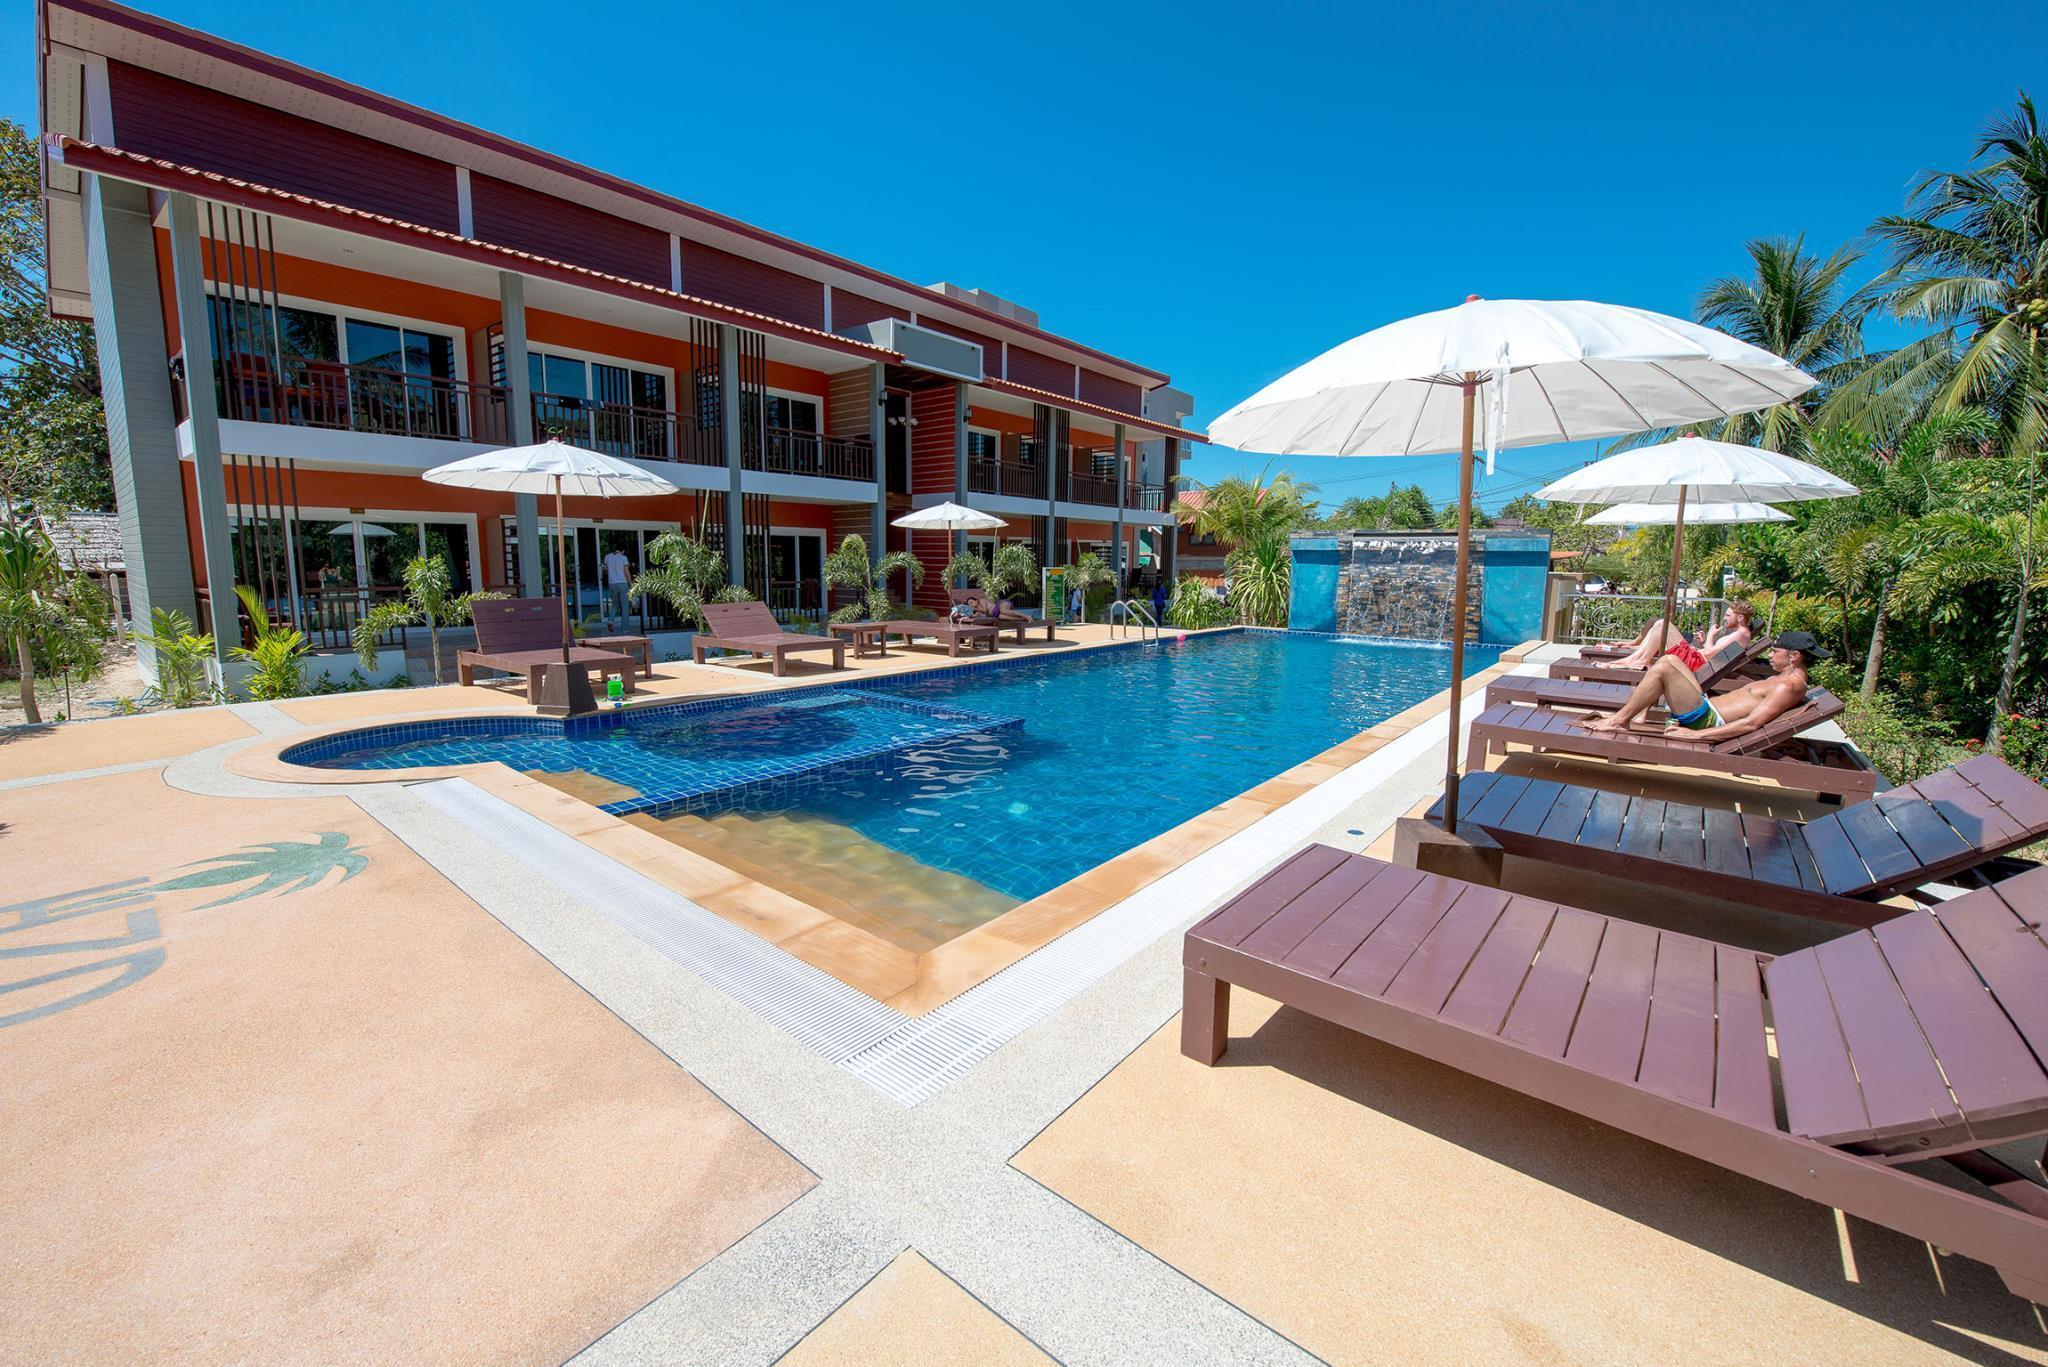 Hatzanda Lanta Resort ฮัตซานดา ลันตา รีสอร์ต